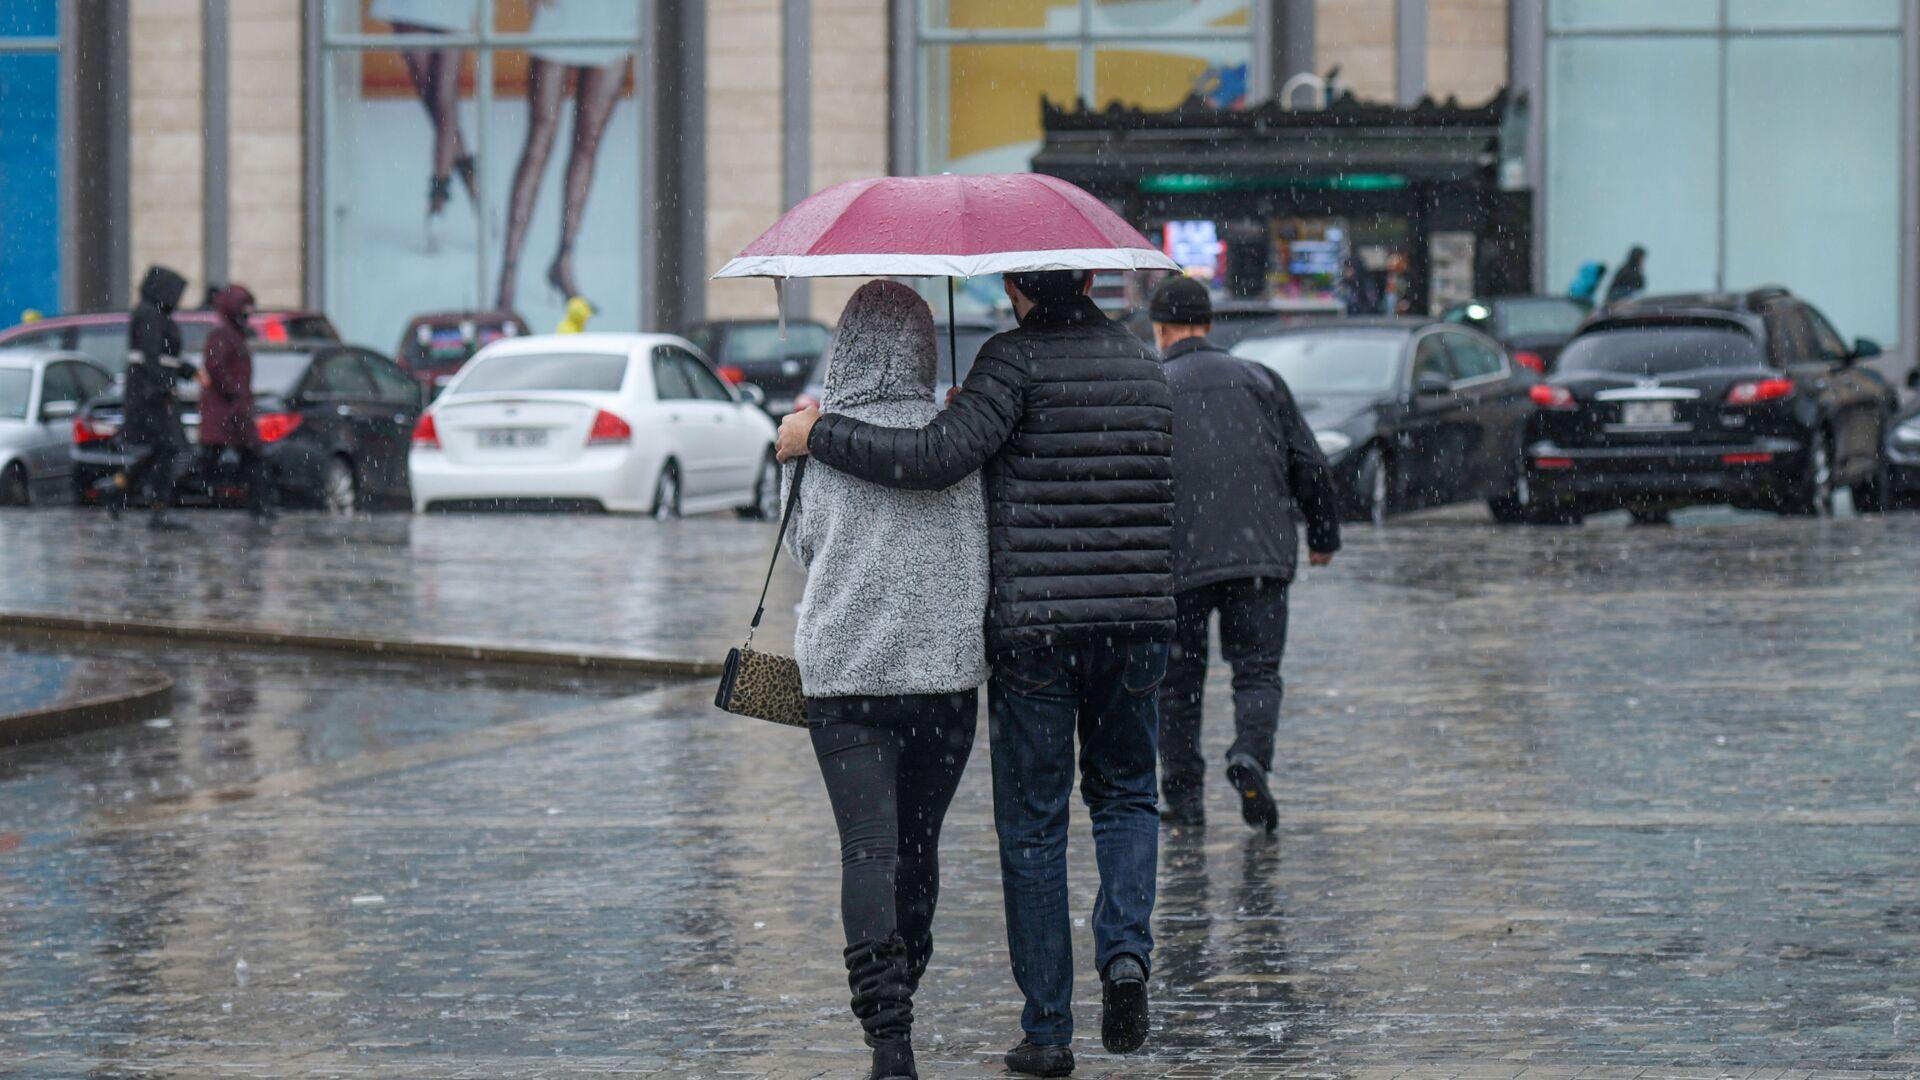 Дождливая погода в Баку - Sputnik Азербайджан, 1920, 04.09.2021